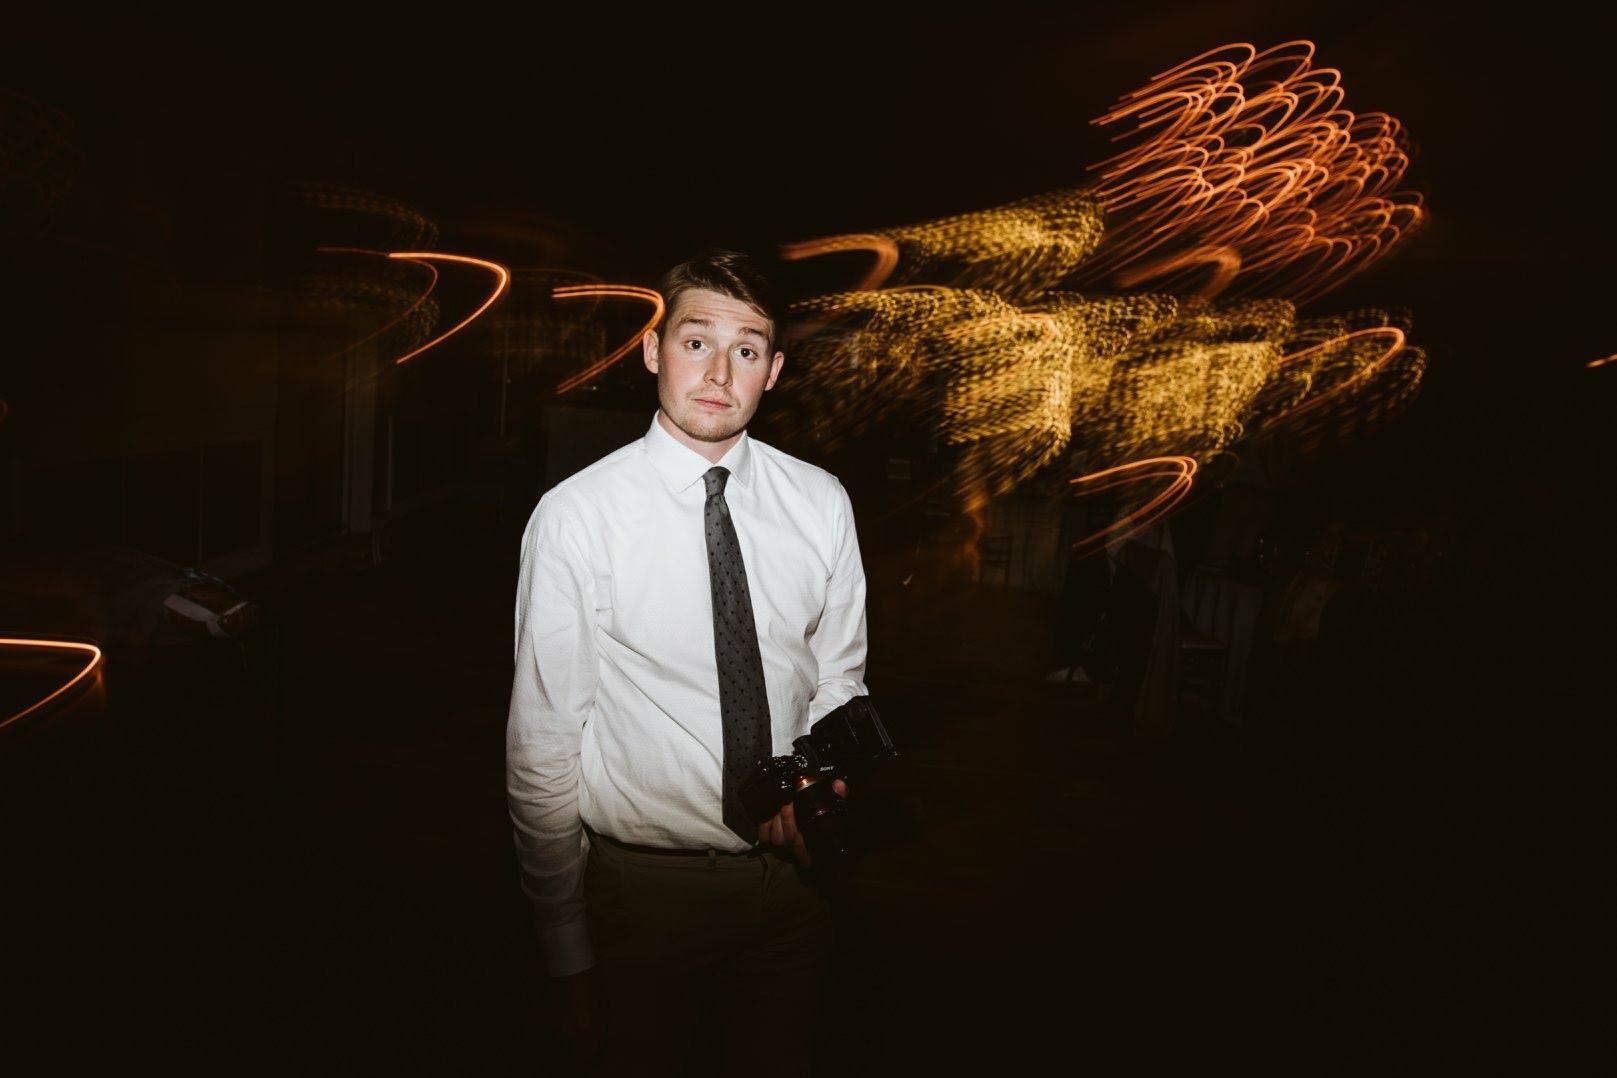 Brendan Cunningham - Freelance Videographer